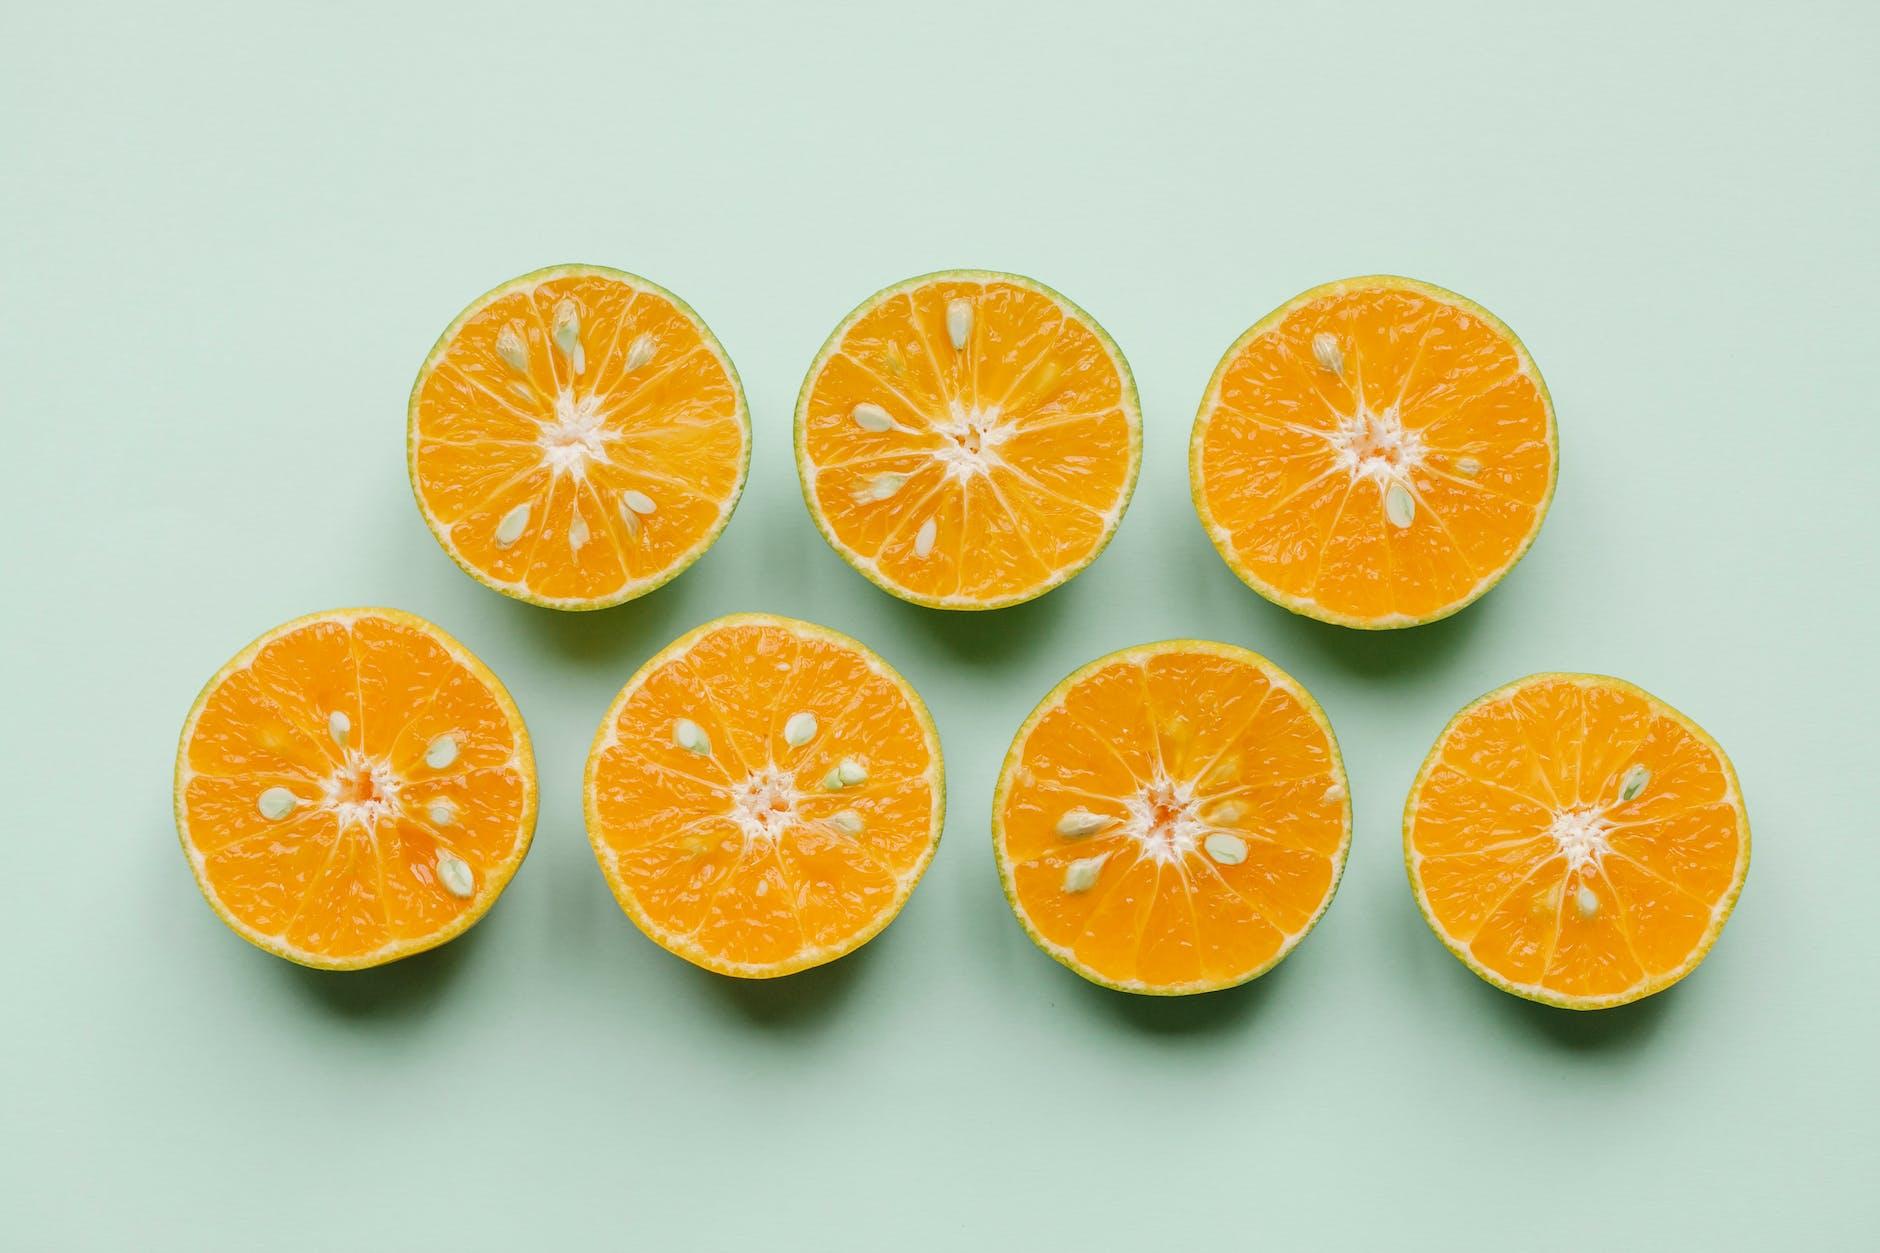 mengenal kepribadian berdasarkan makanan asam